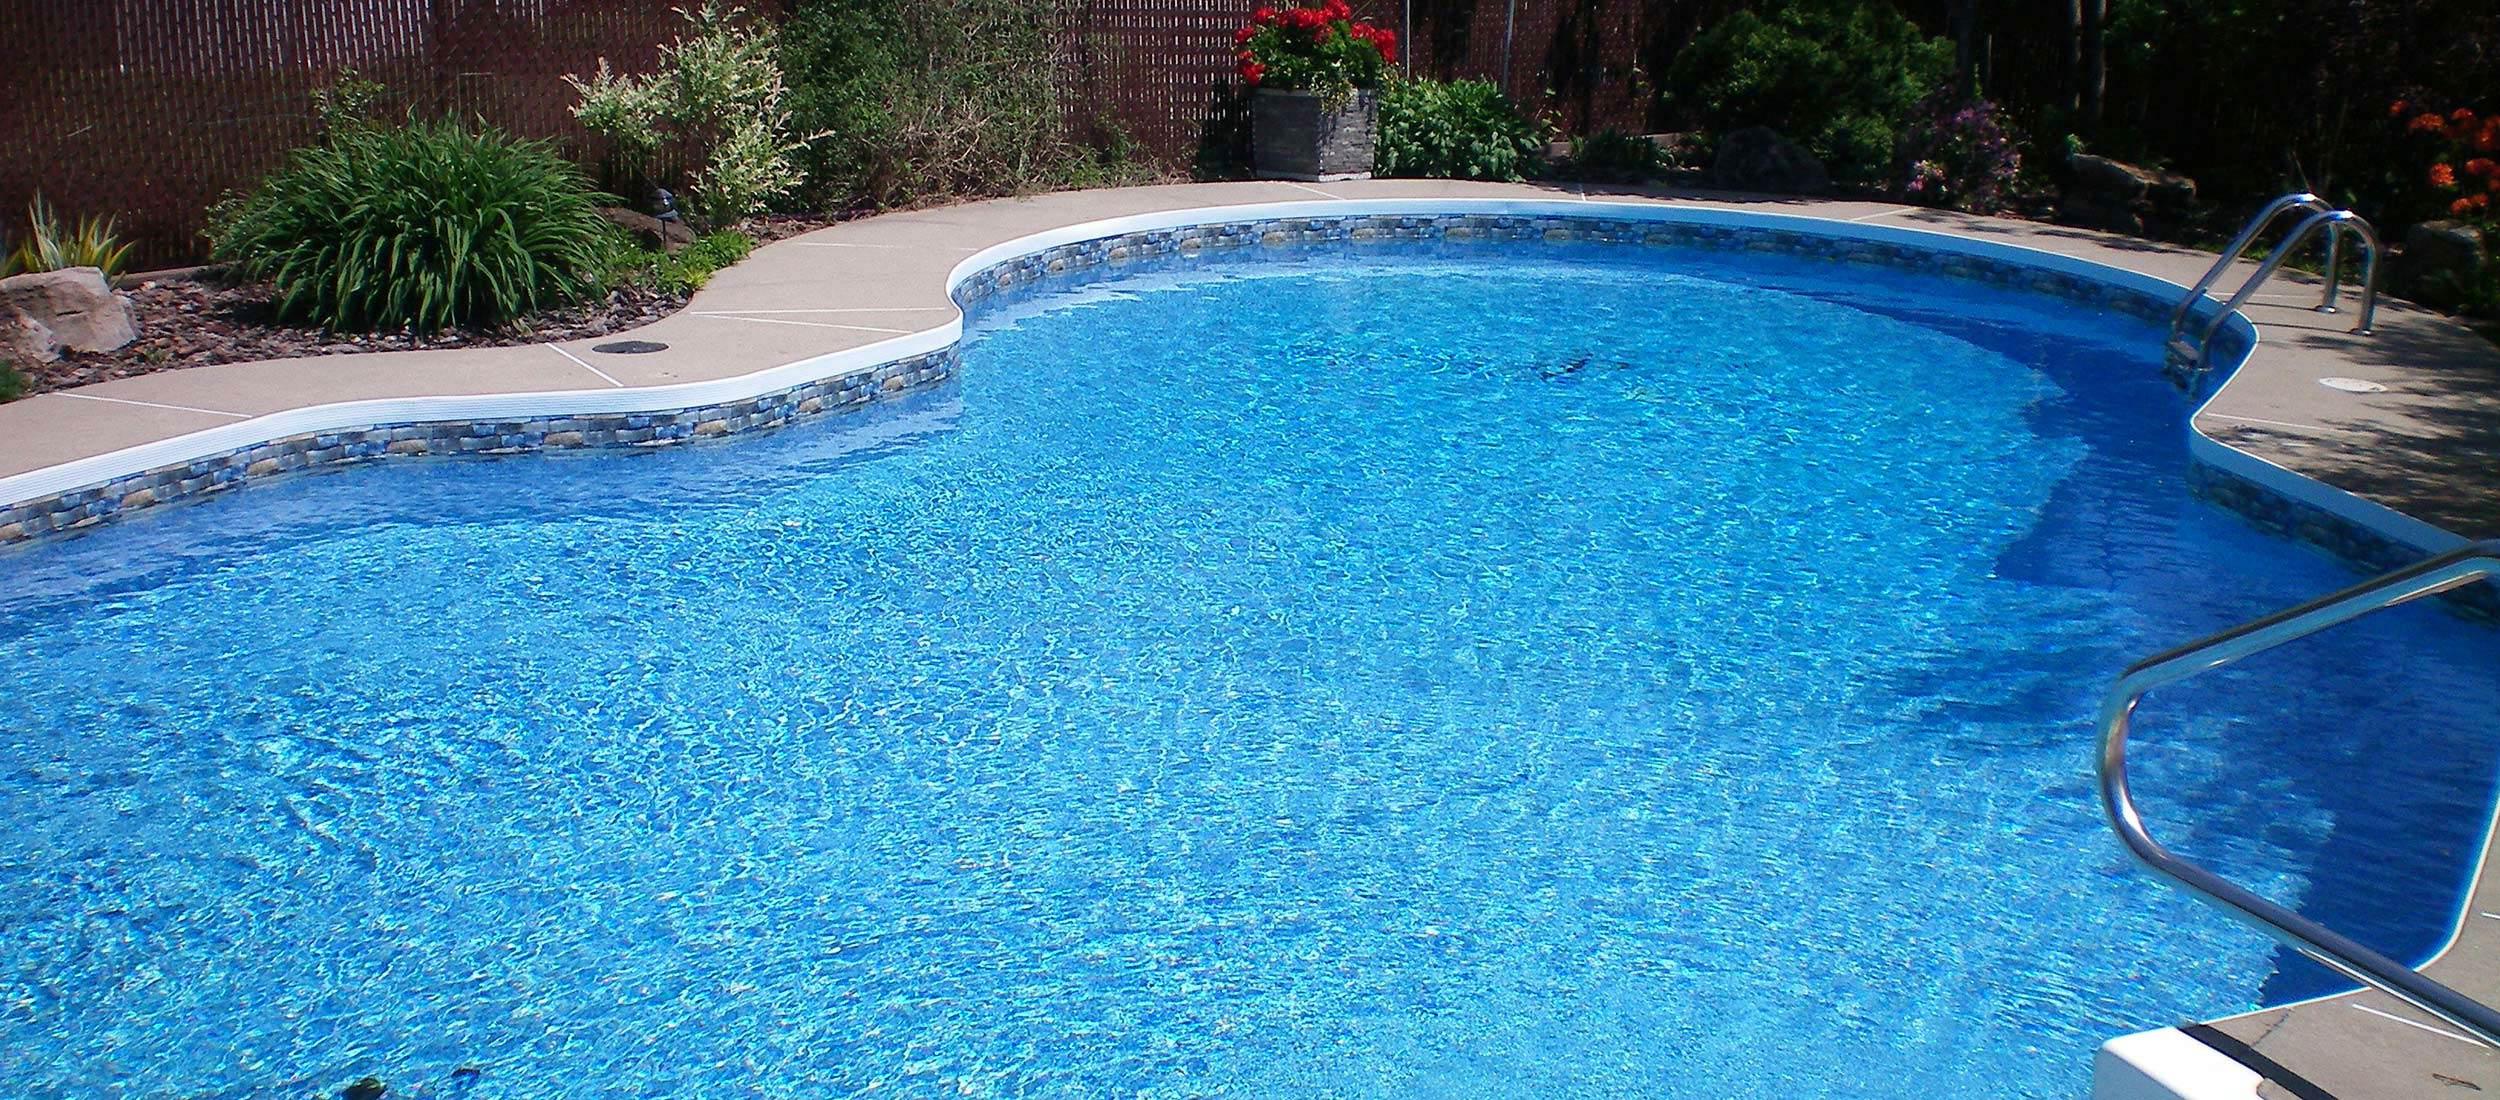 luxe piscine pour femme nord piscine. Black Bedroom Furniture Sets. Home Design Ideas